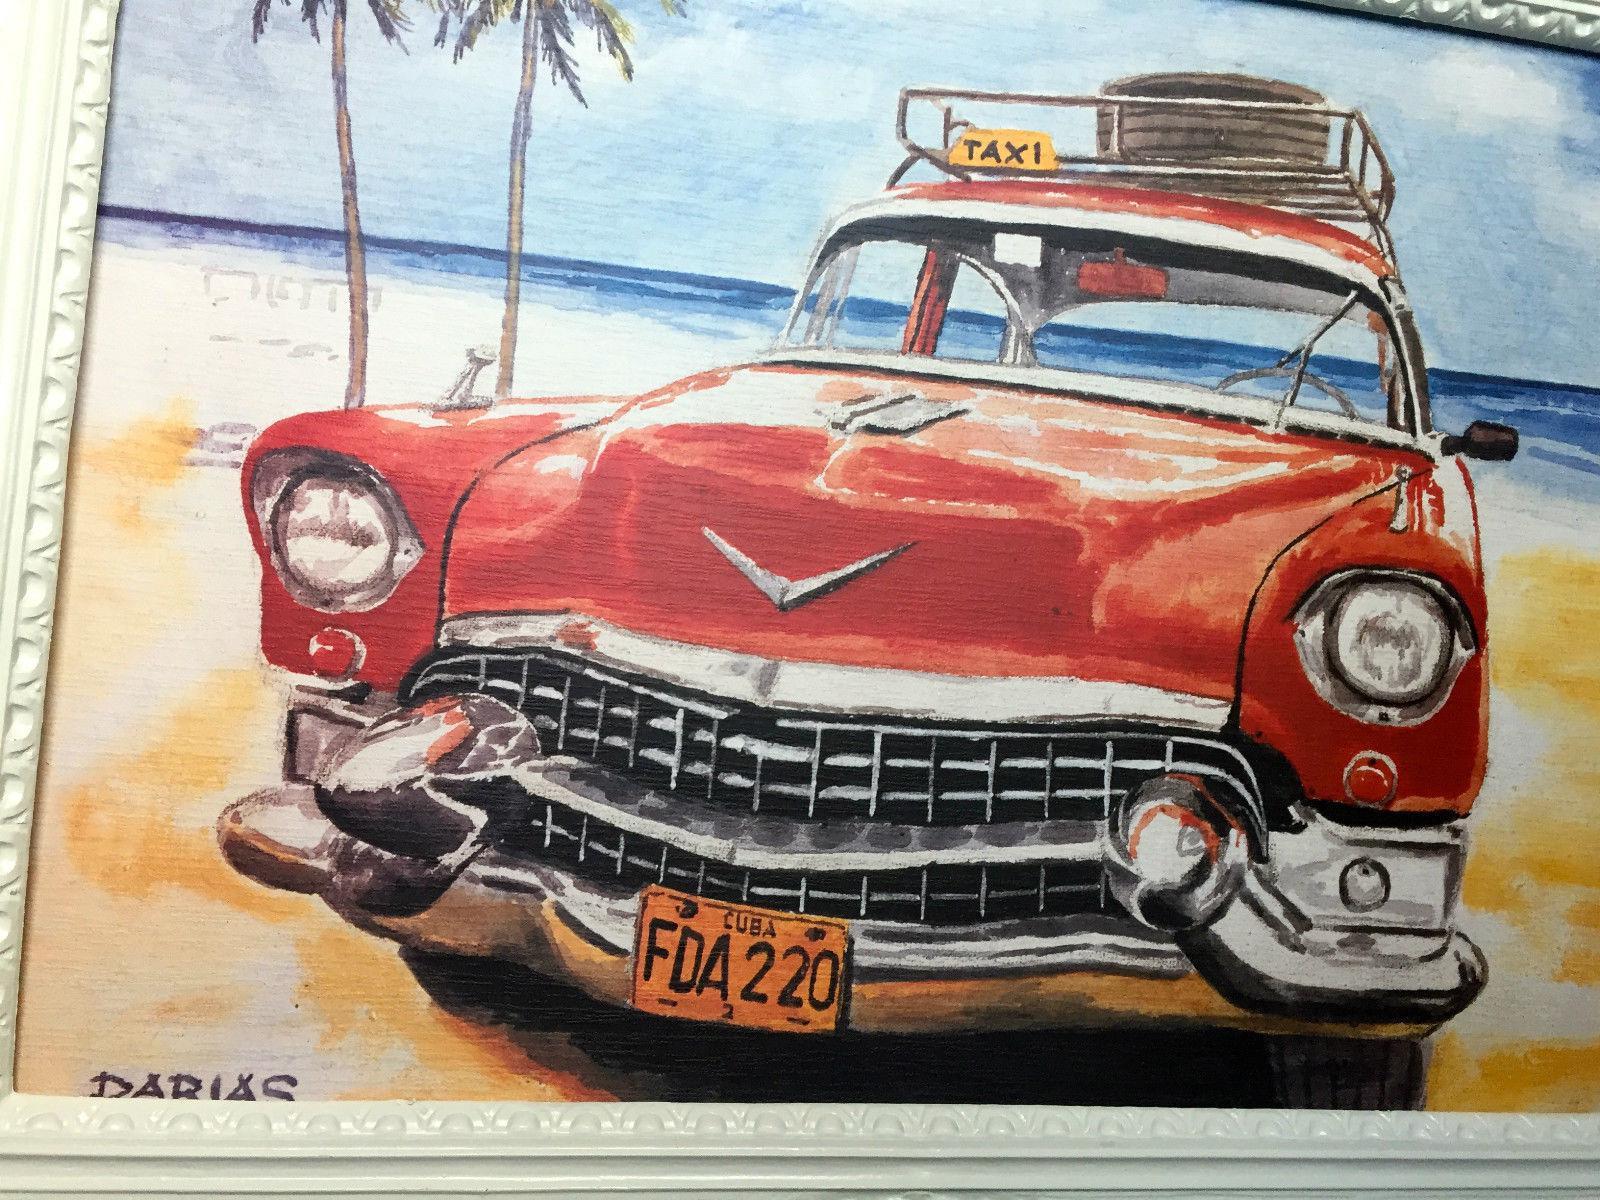 Auto Cuba Taxi Rot Bild Rahmen Wandbild 70x90 Oldtimer Classic Cuban ...